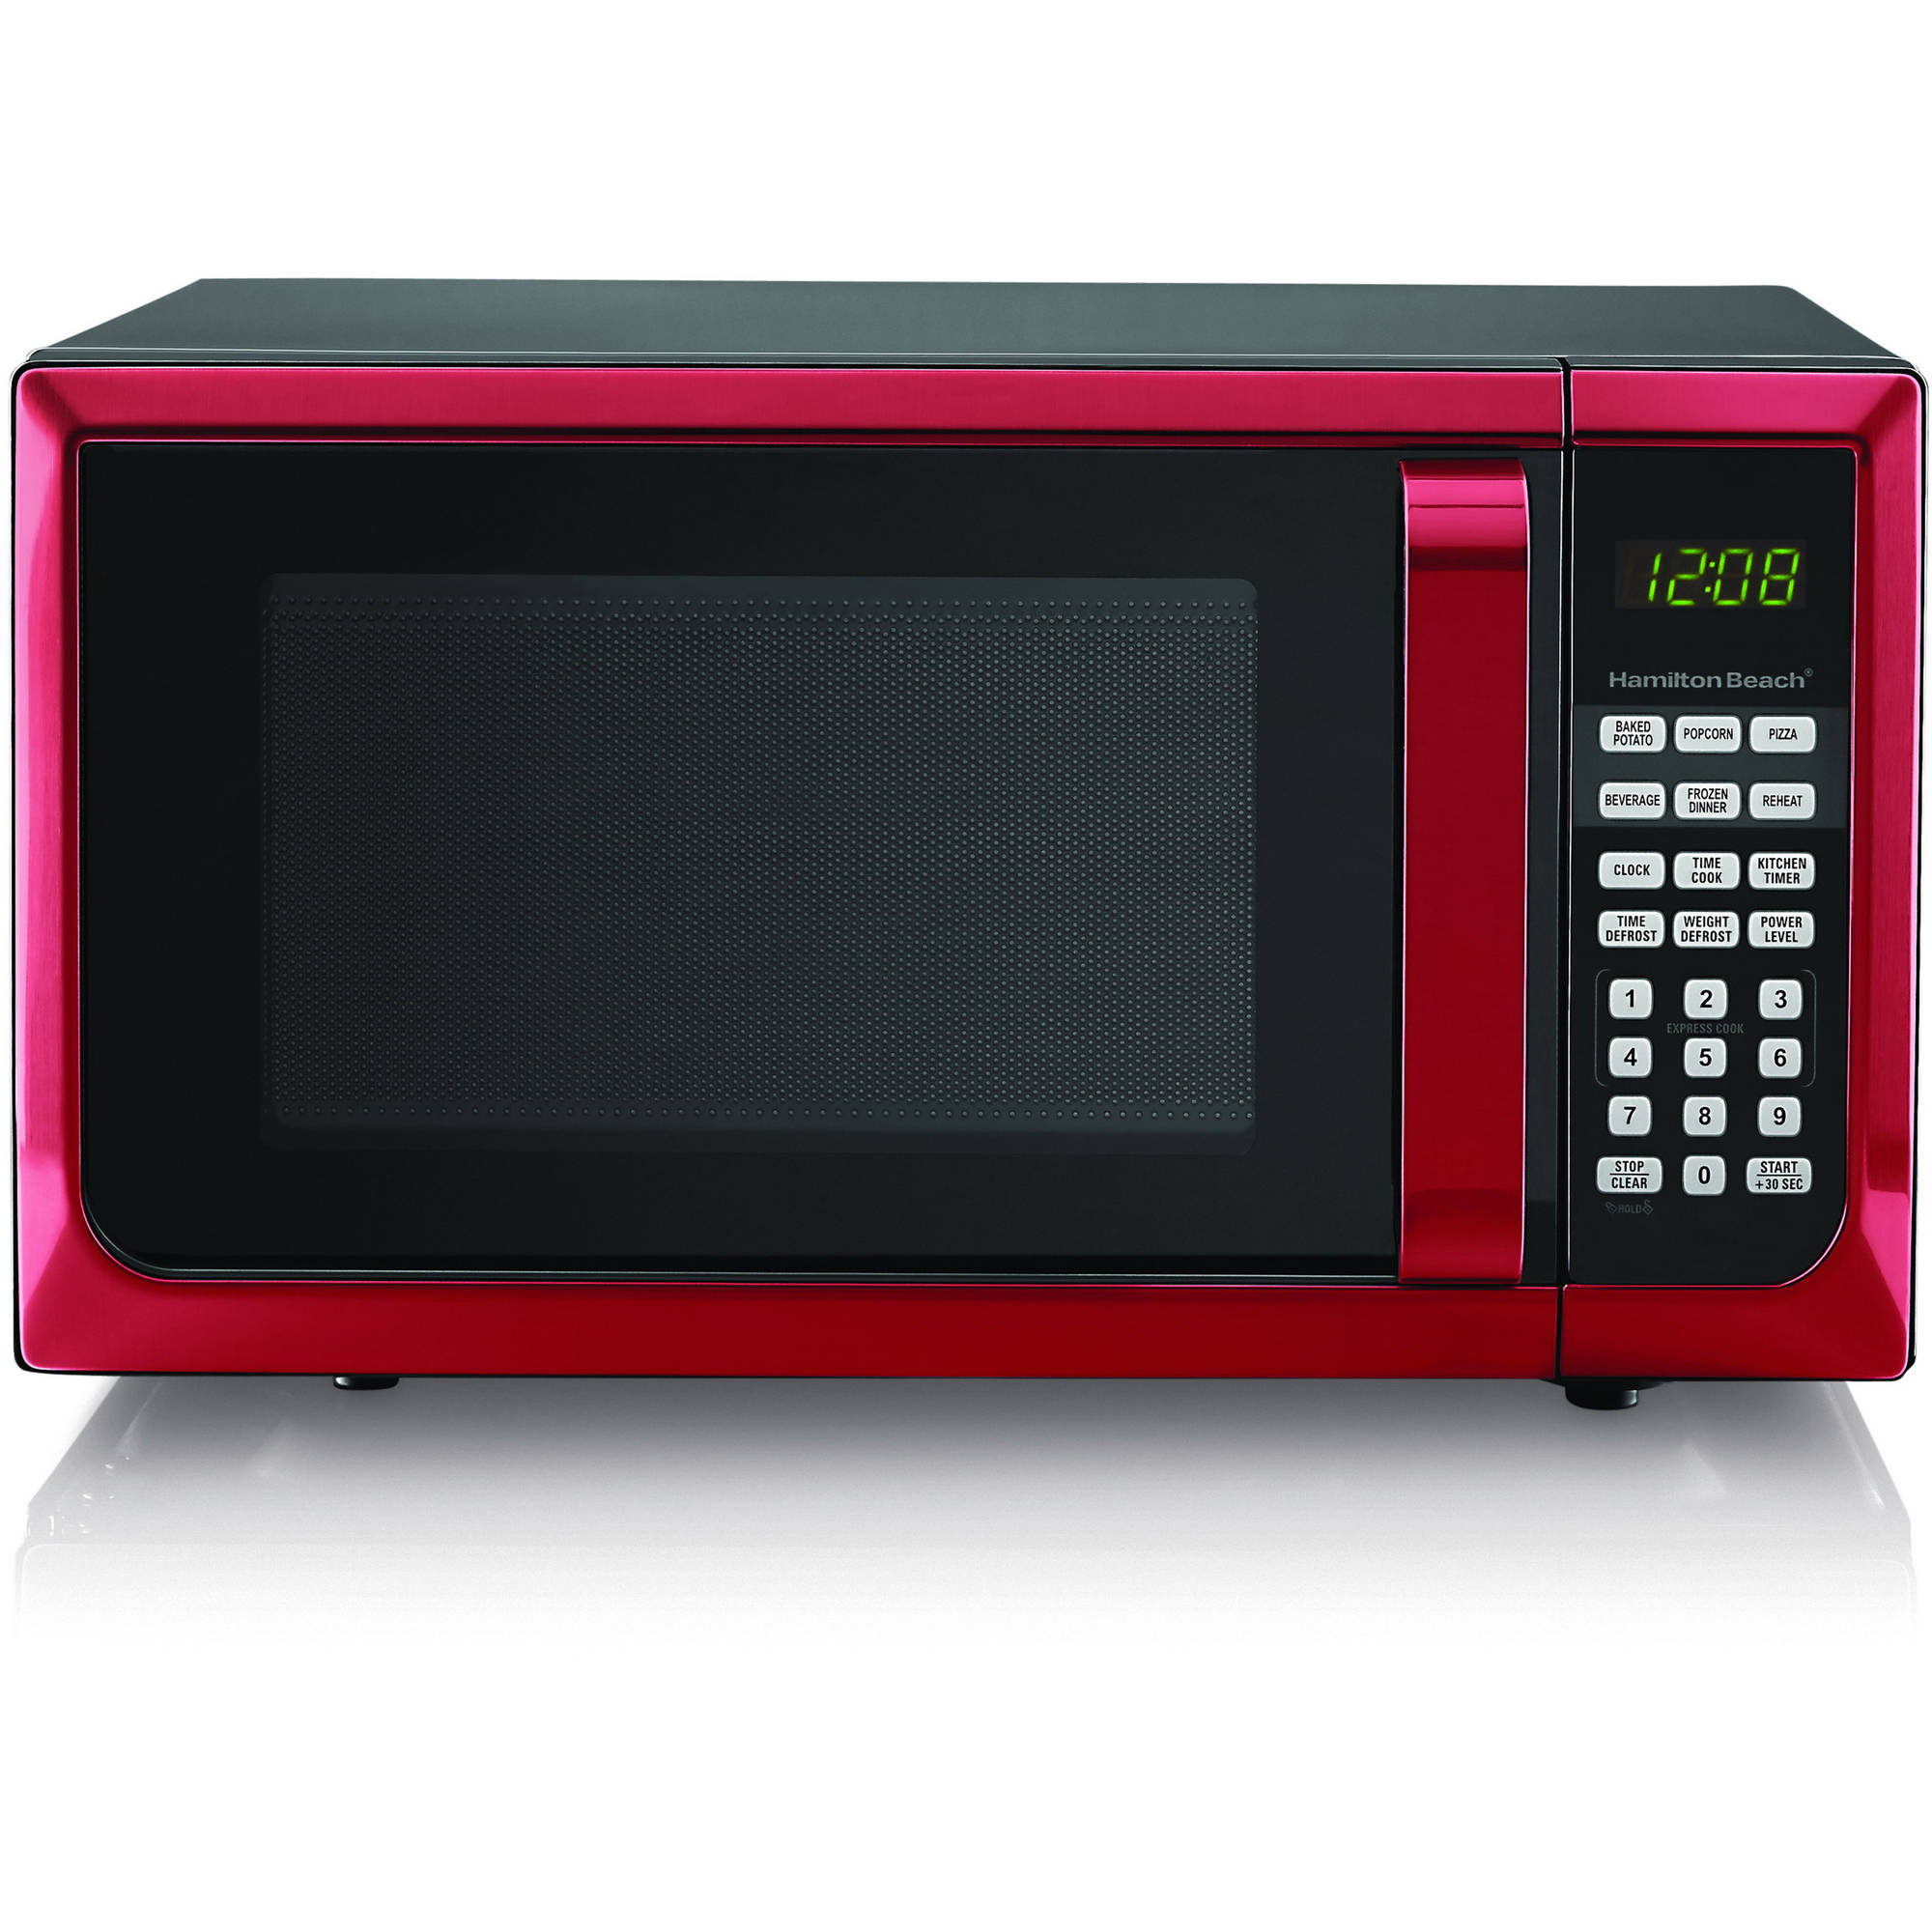 Stainless Steel Modern Home Appliance Hamilton Beach 0.9 cu.ft Microwave Oven